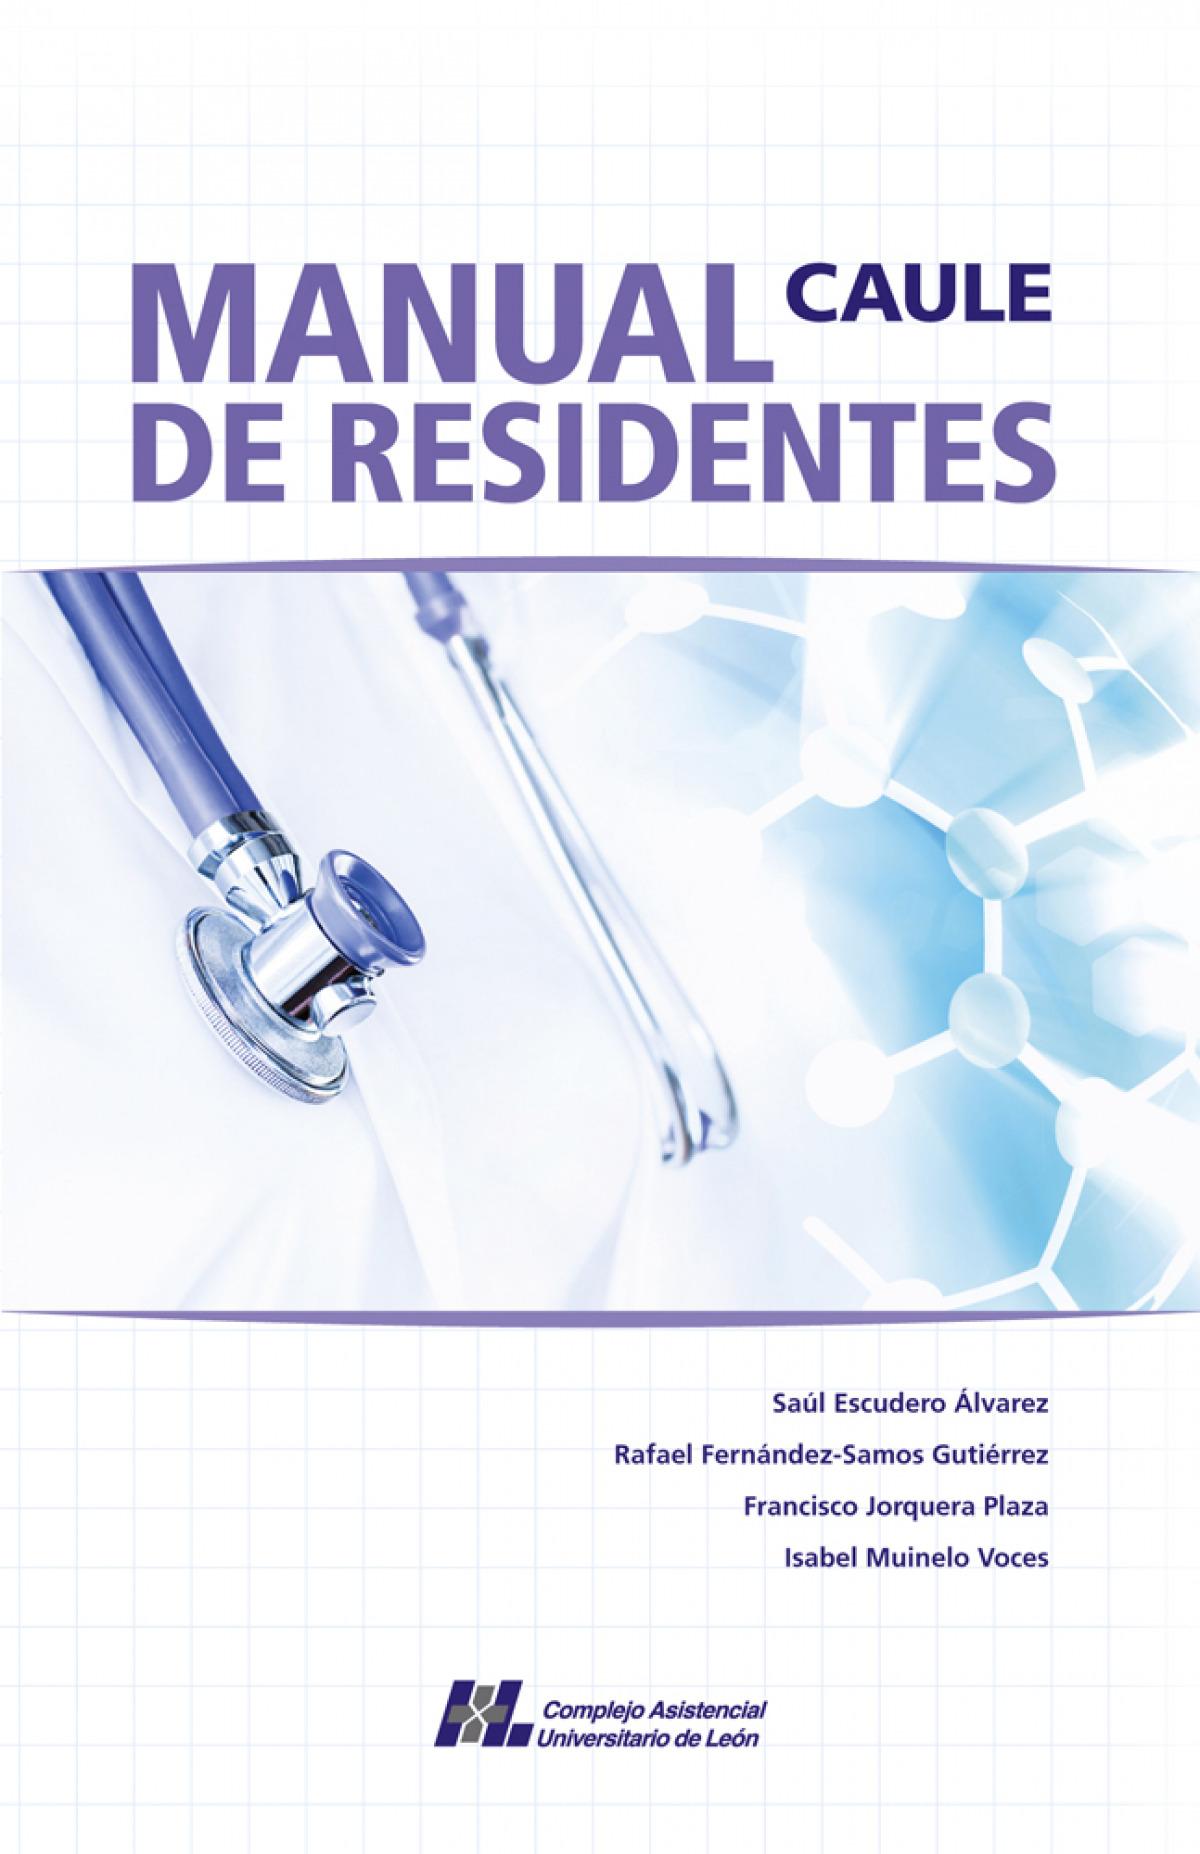 Manual de residentes CAULE